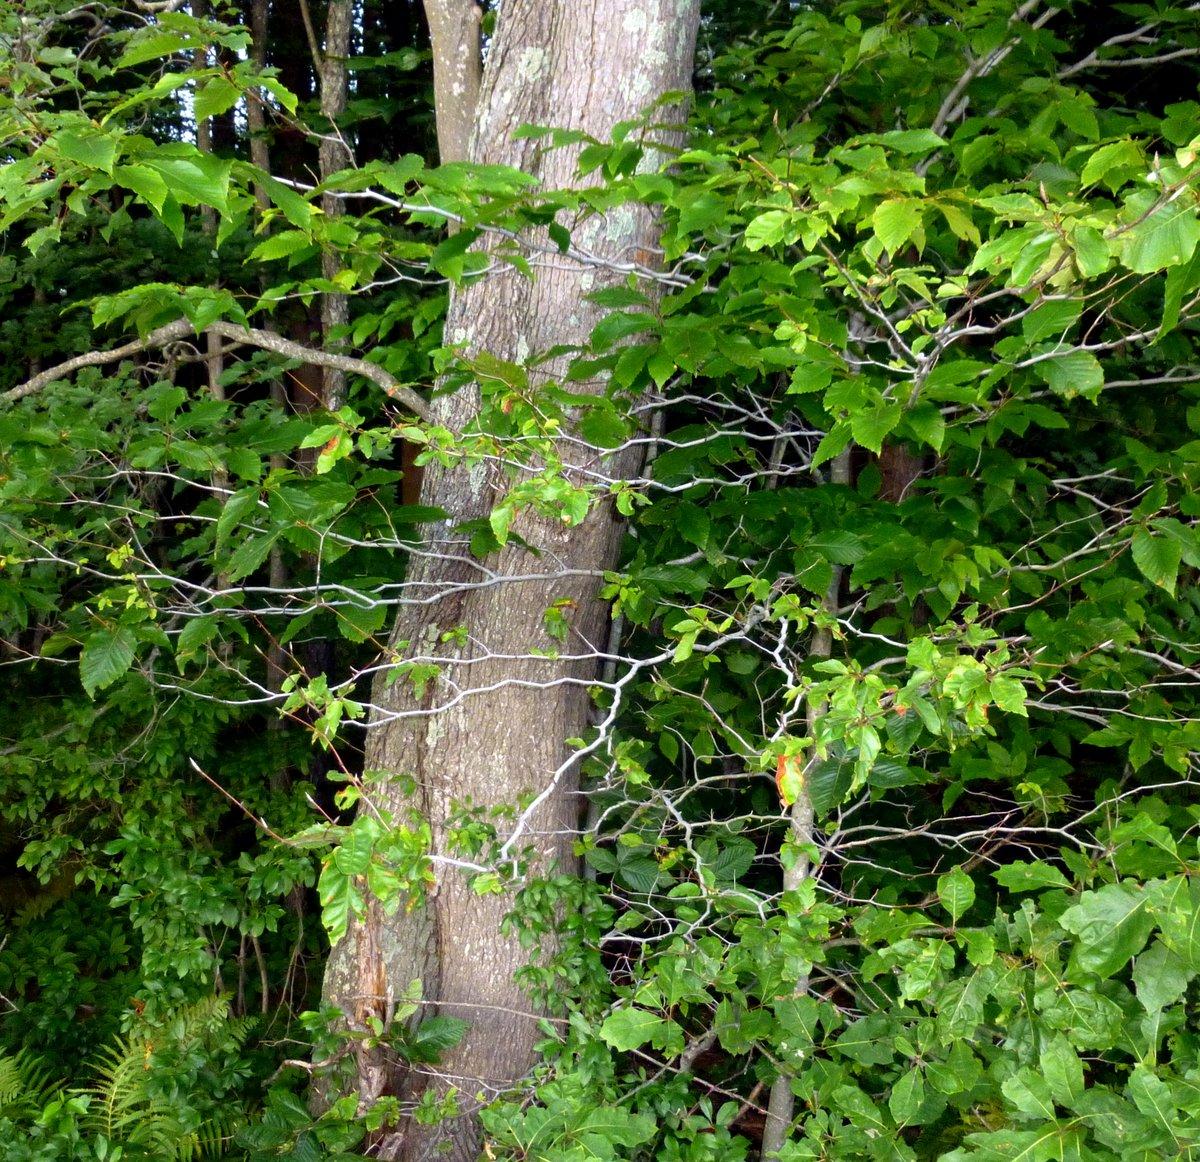 6. Beech Branches